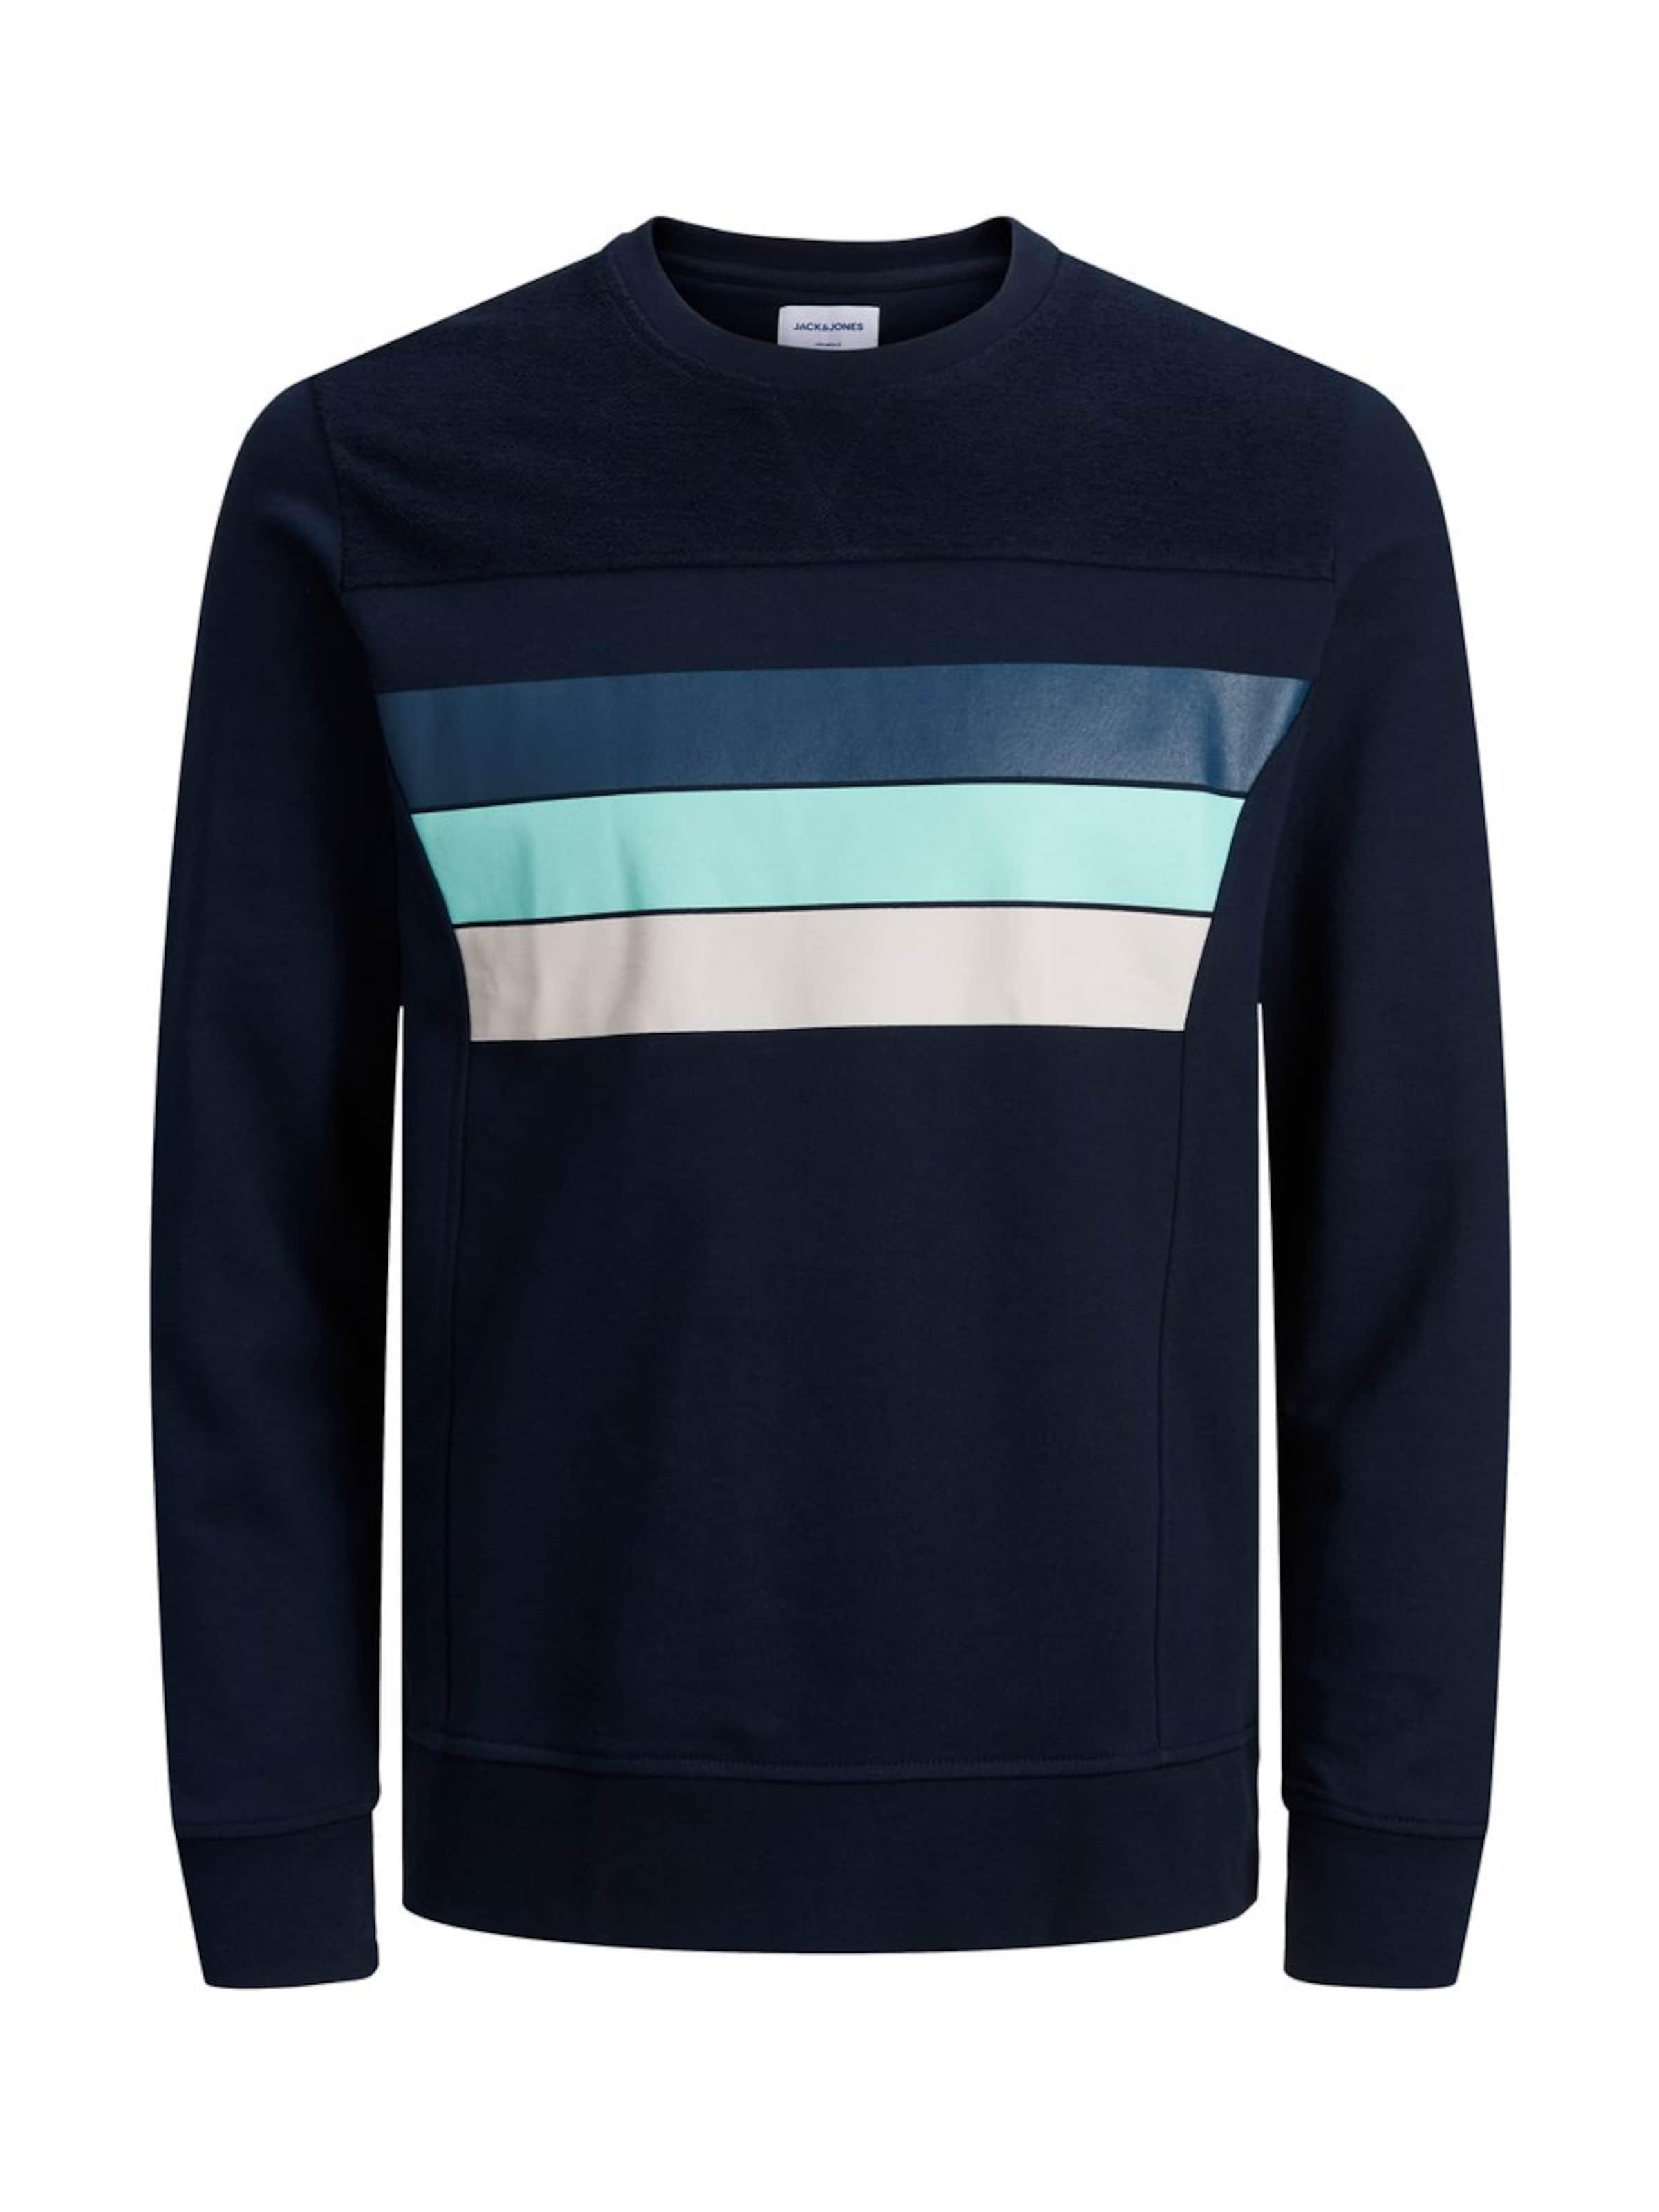 NudeBleu En Jones Sweat shirt Cobalt Jackamp; Aqua Denim UMVzqpSG